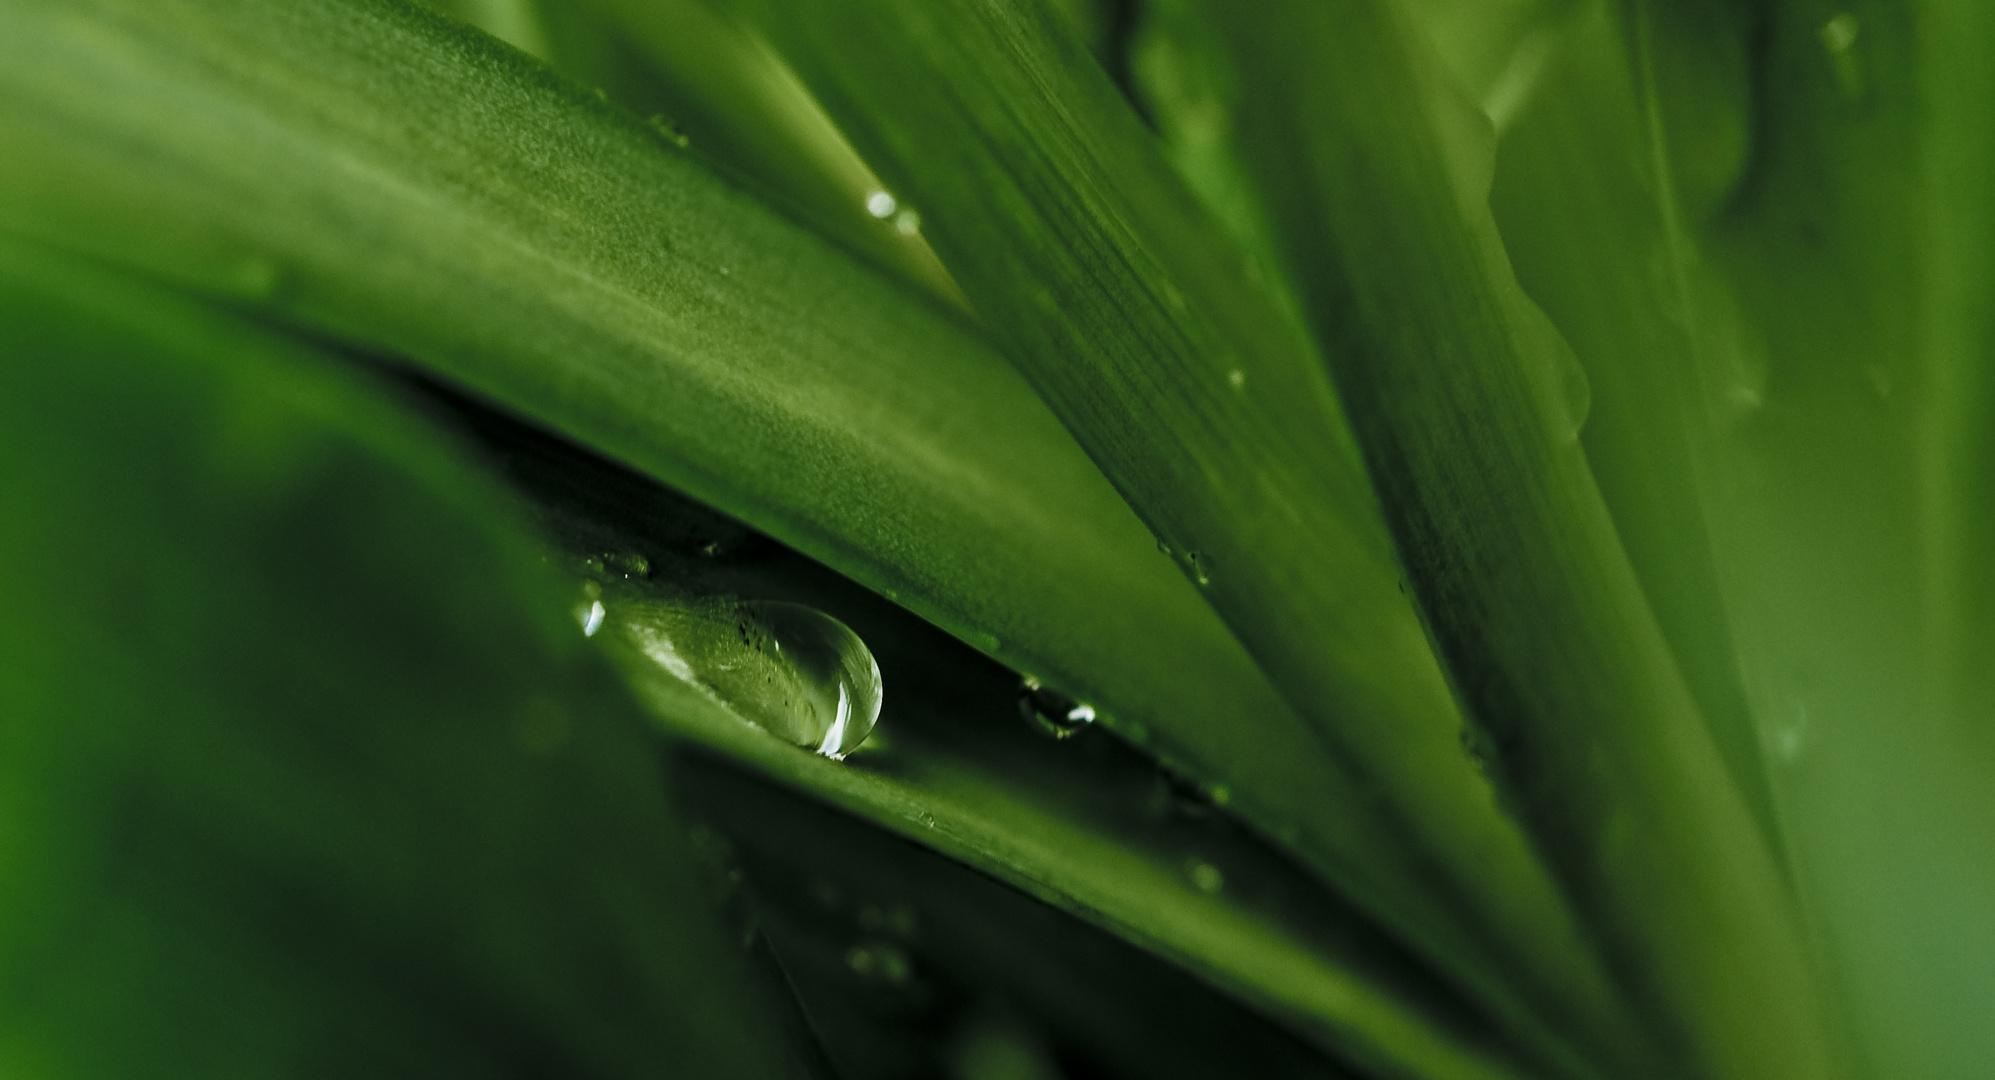 water_drop_plant